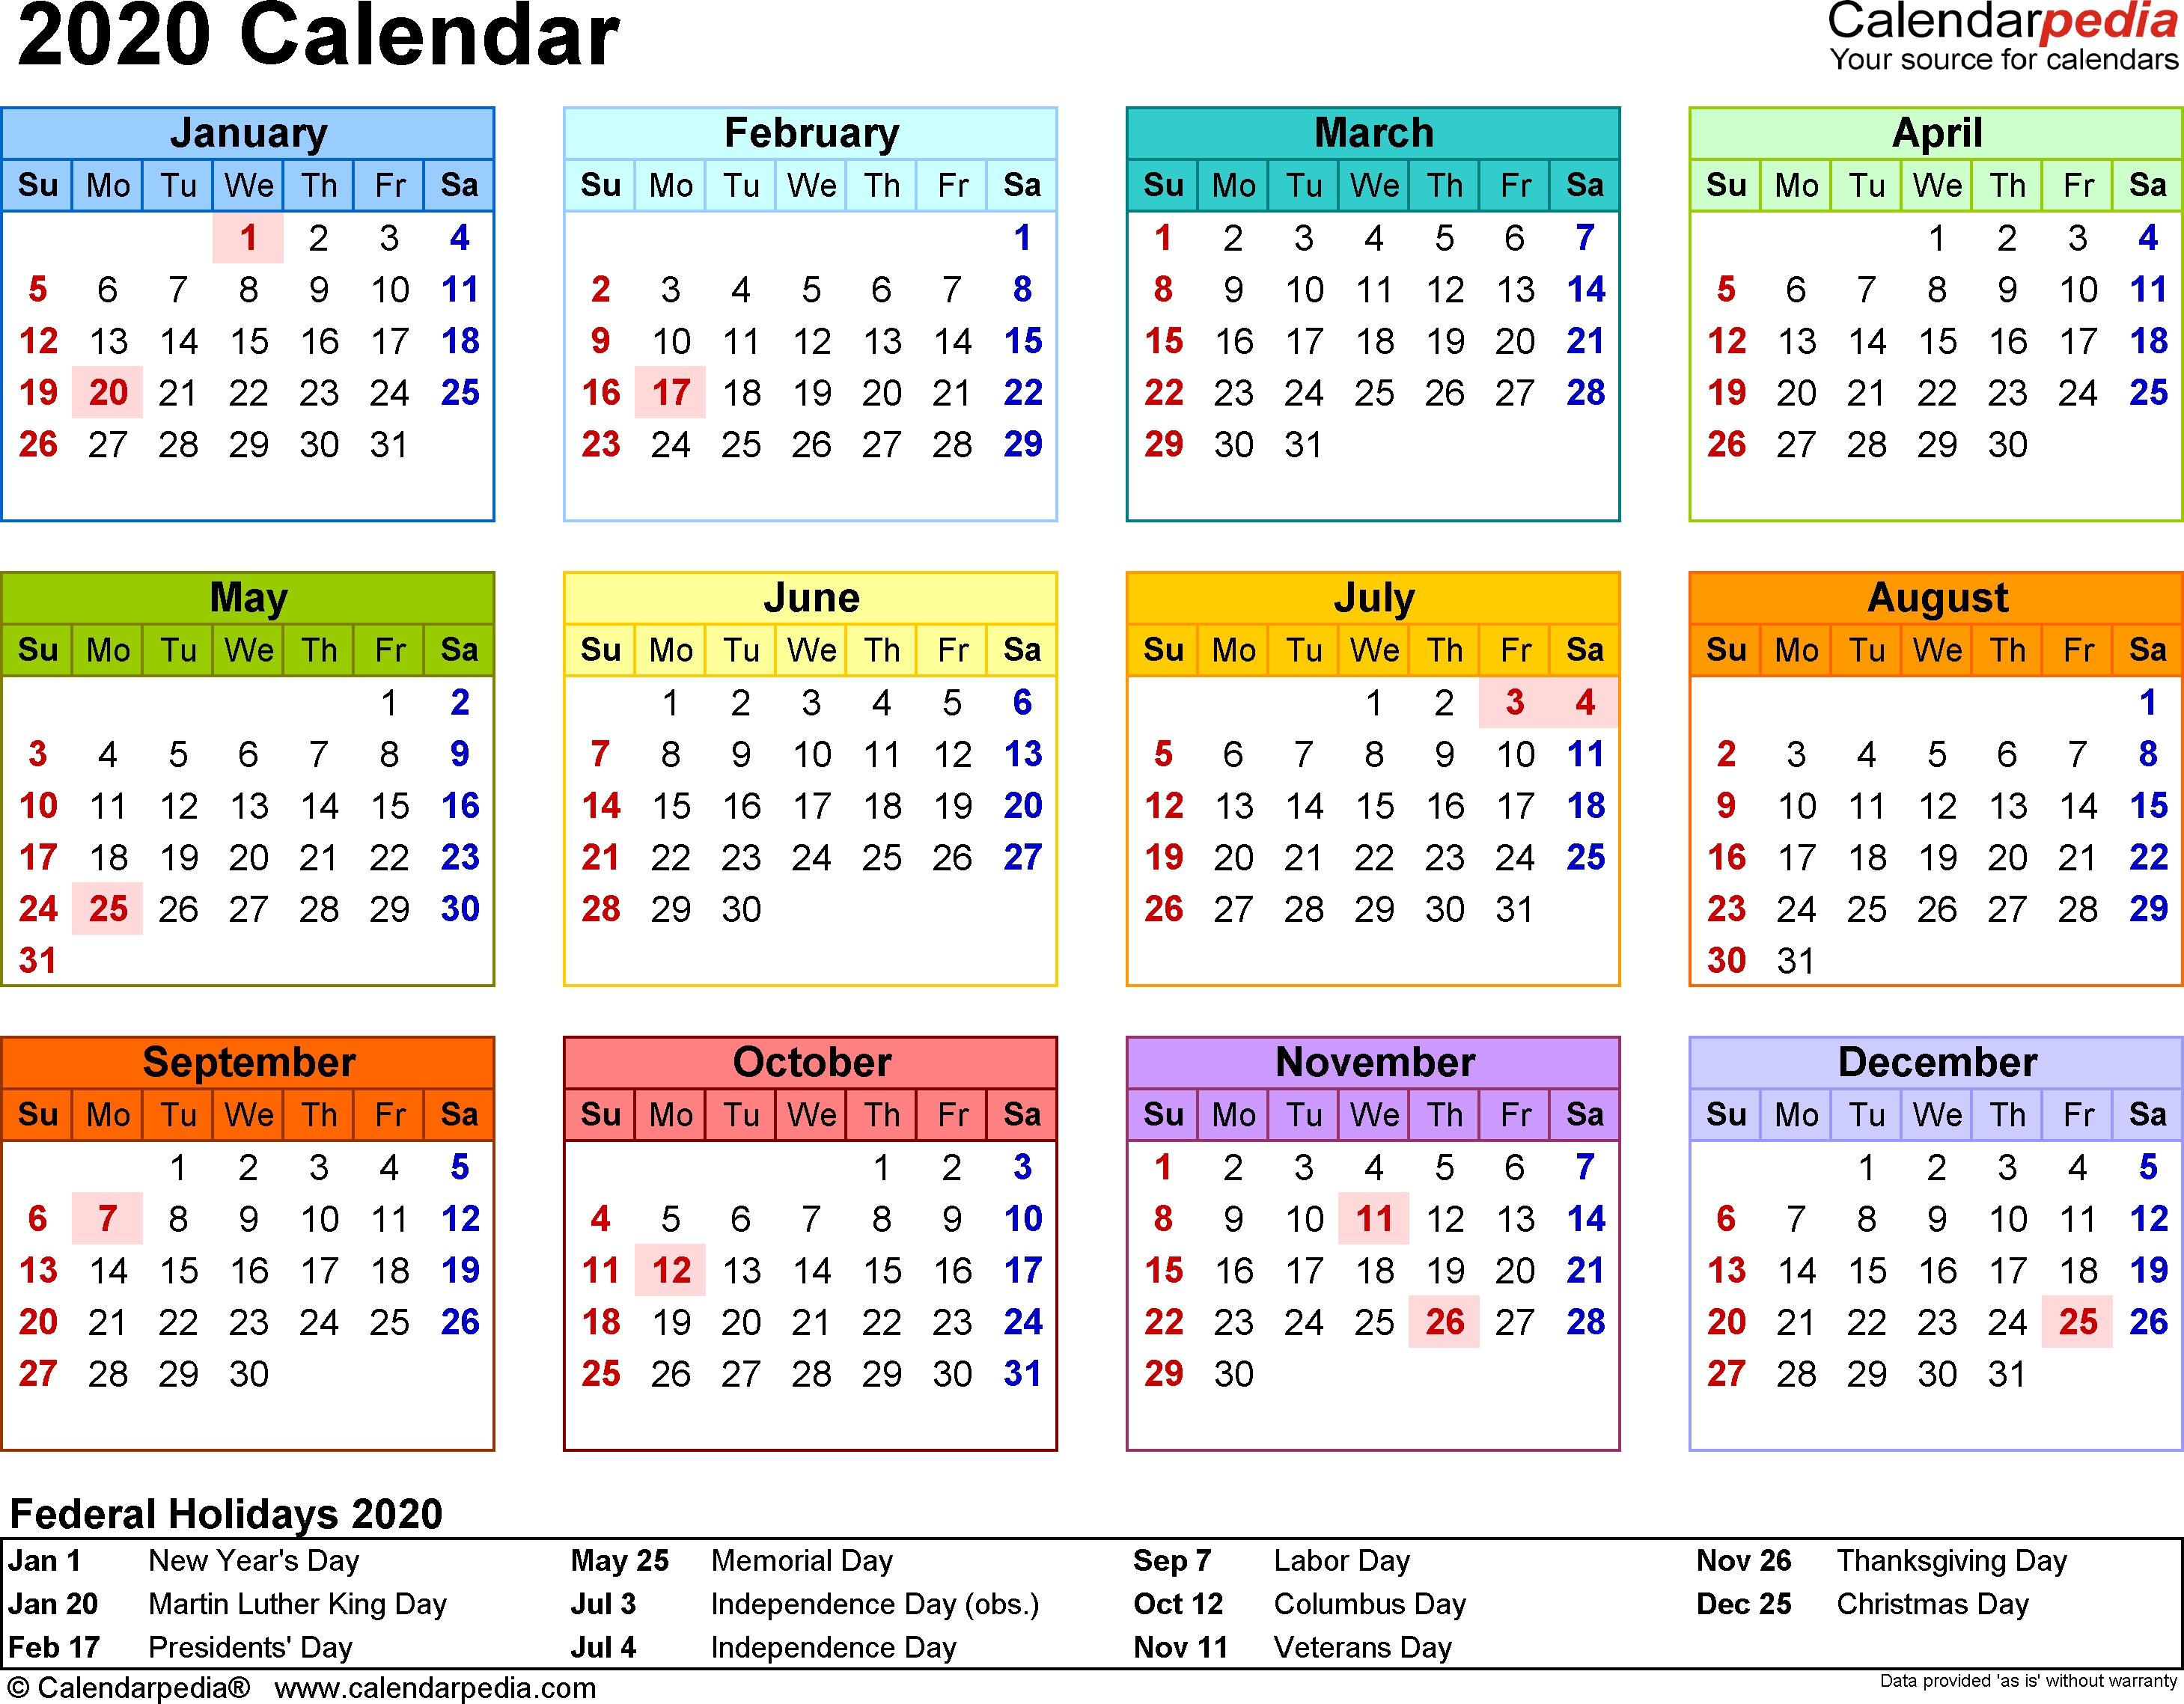 2020 Calendar - 17 Free Printable Word Calendar Templates for Free Printable Calendar For 2020 With No Download